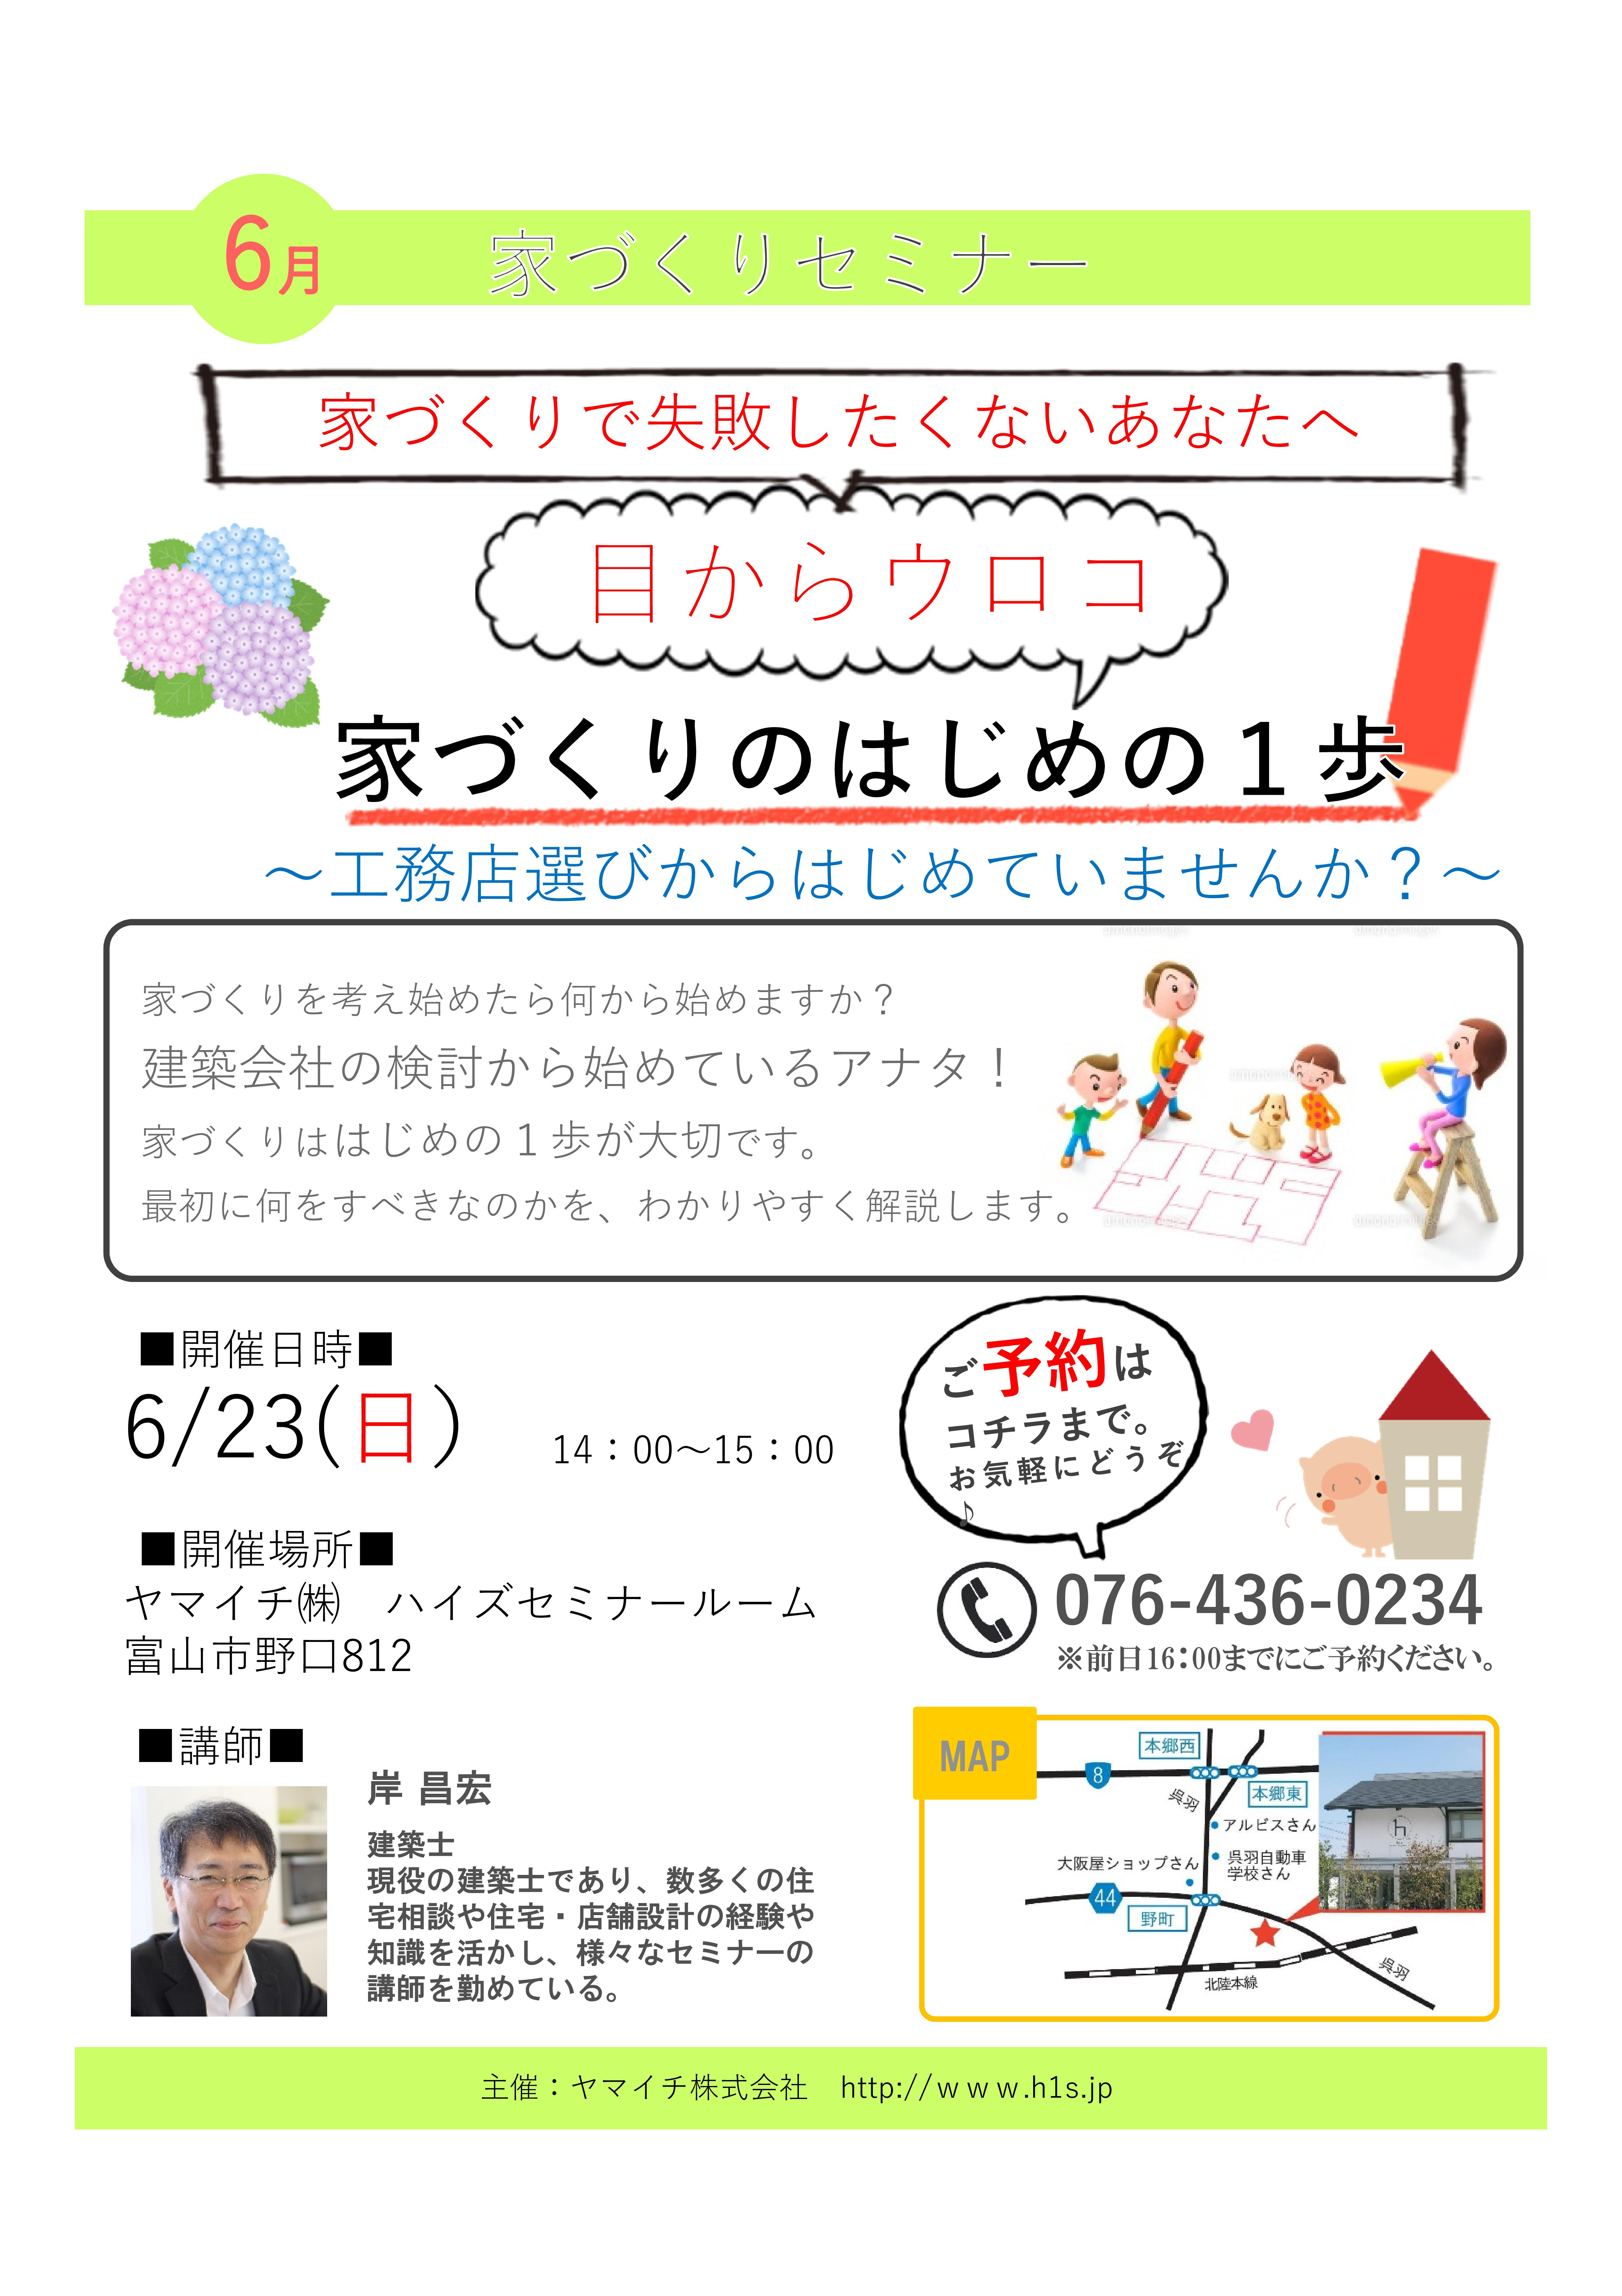 seminar-20190623